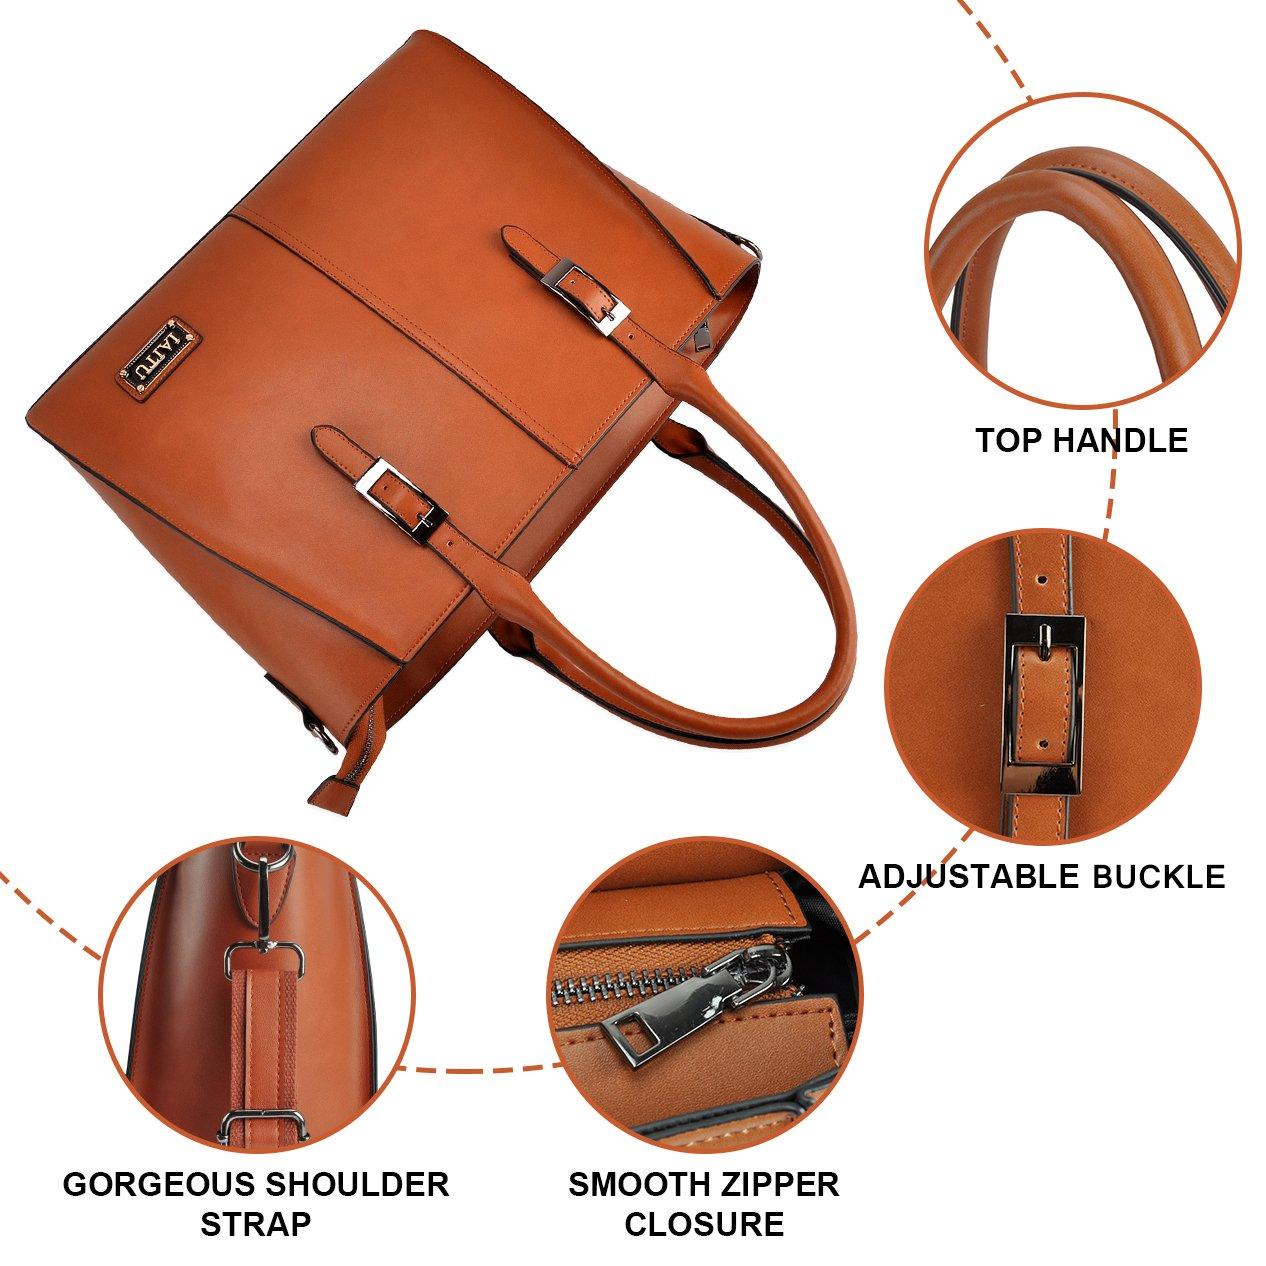 IAITU Laptop Tote Bag,15.6 Inch Crossbody Laptop Bag Casual Work Business Handbag with Smooth Zipper for Women(Brown) by IAITU (Image #5)